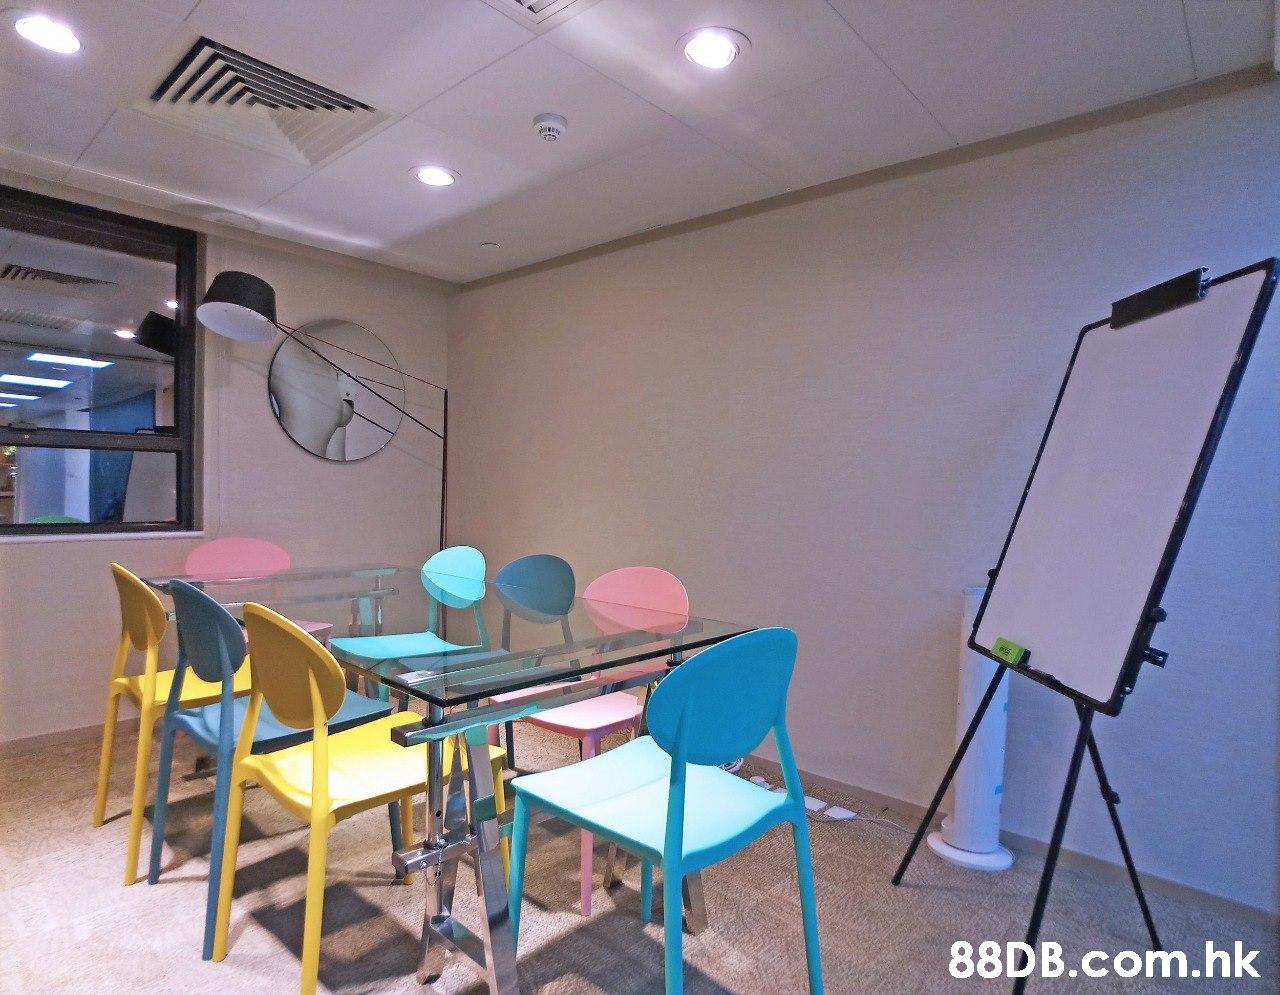 .hk  Room,Table,Interior design,Furniture,Classroom